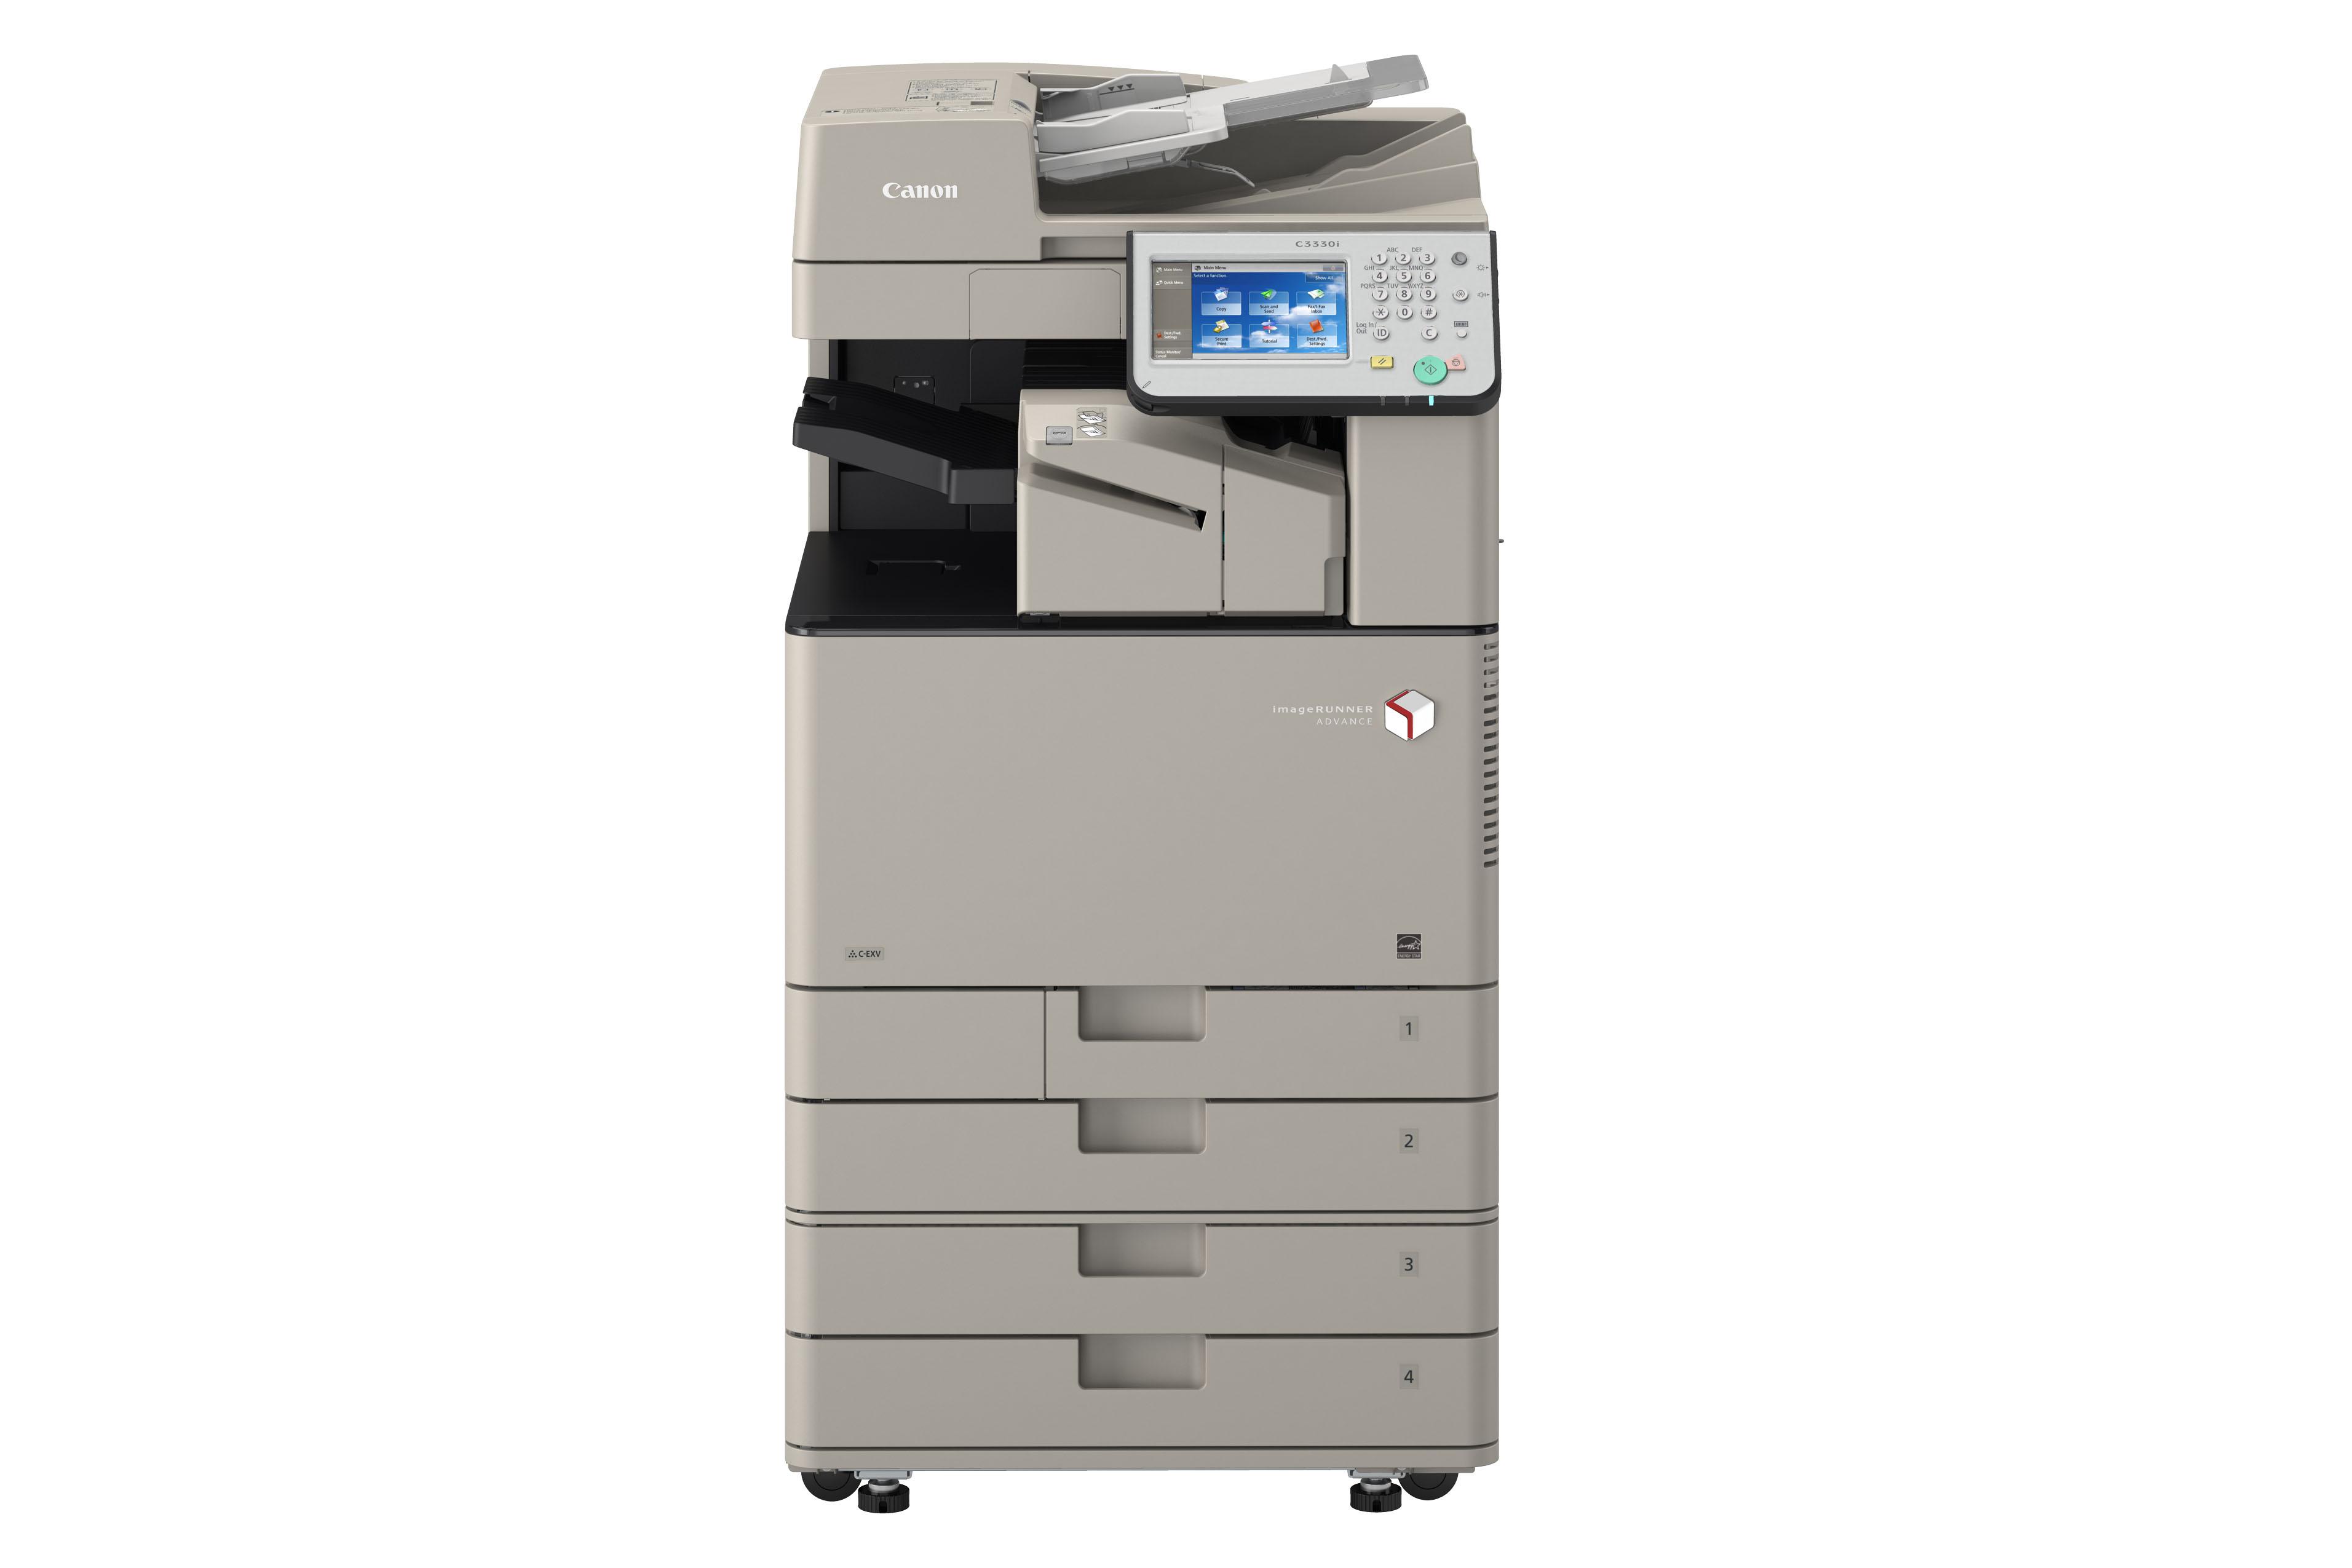 iR-ADV_C3330i CST InnFin Front